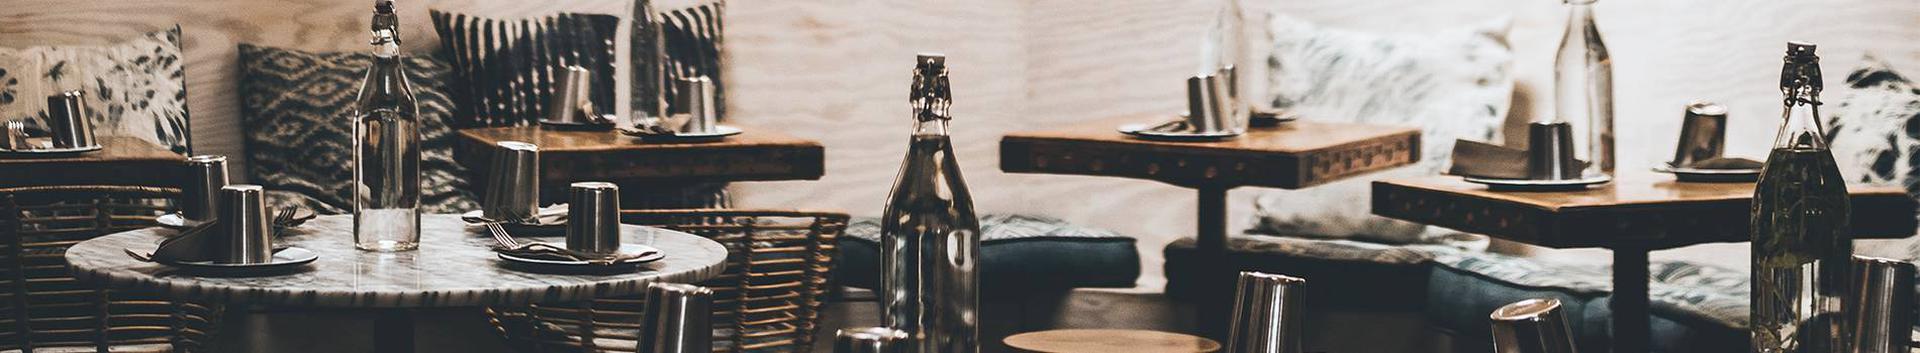 56101_toitlustus-restoran-jm-_75398681_xl.jpg